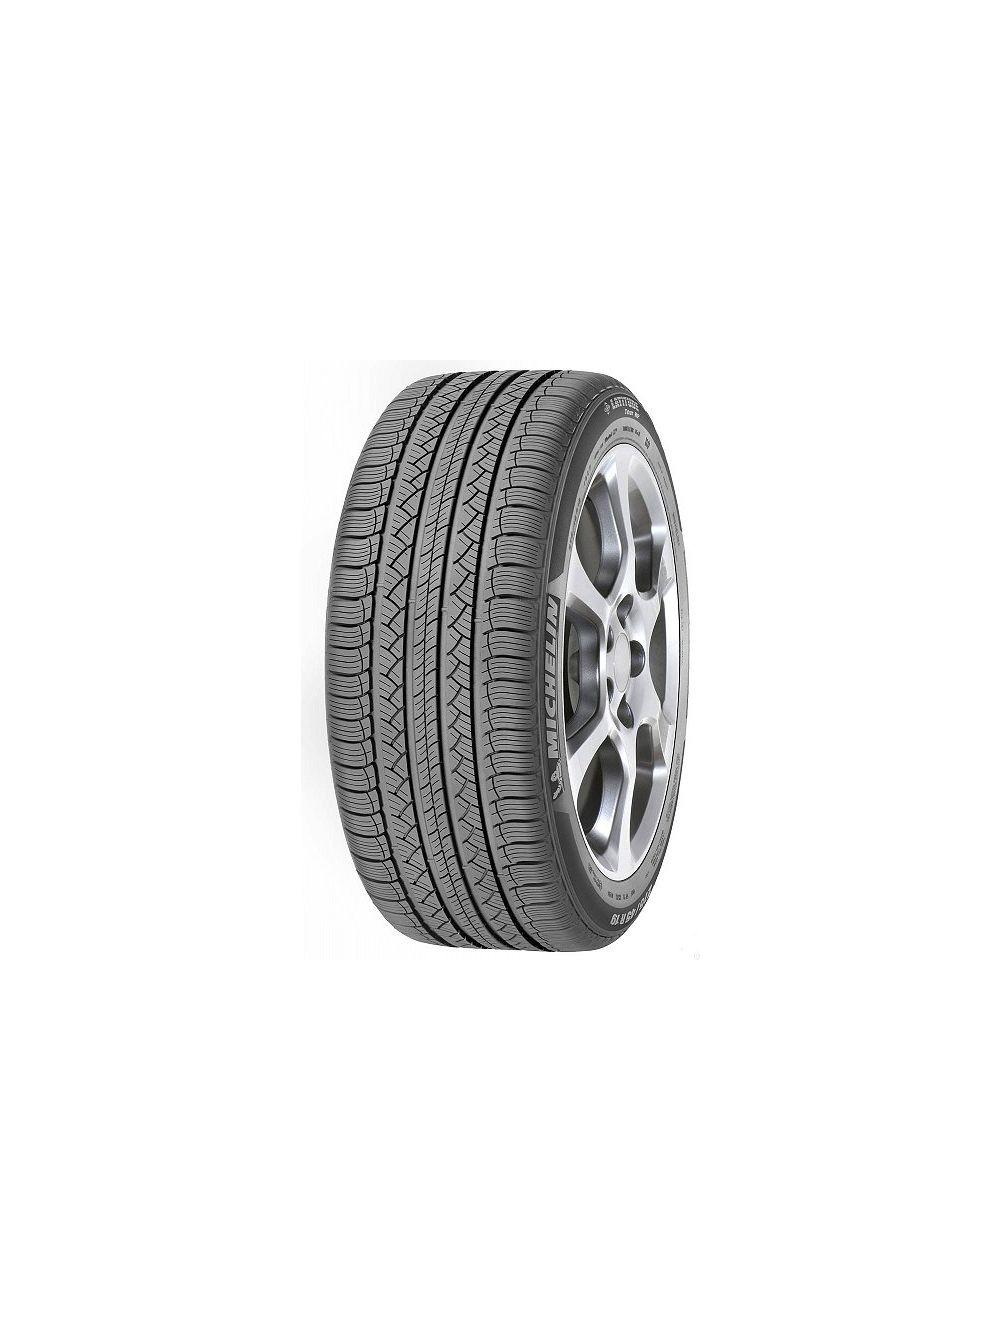 Michelin 235/60R18 V Latitude Tour HP XL JLR DT Nyári gumi